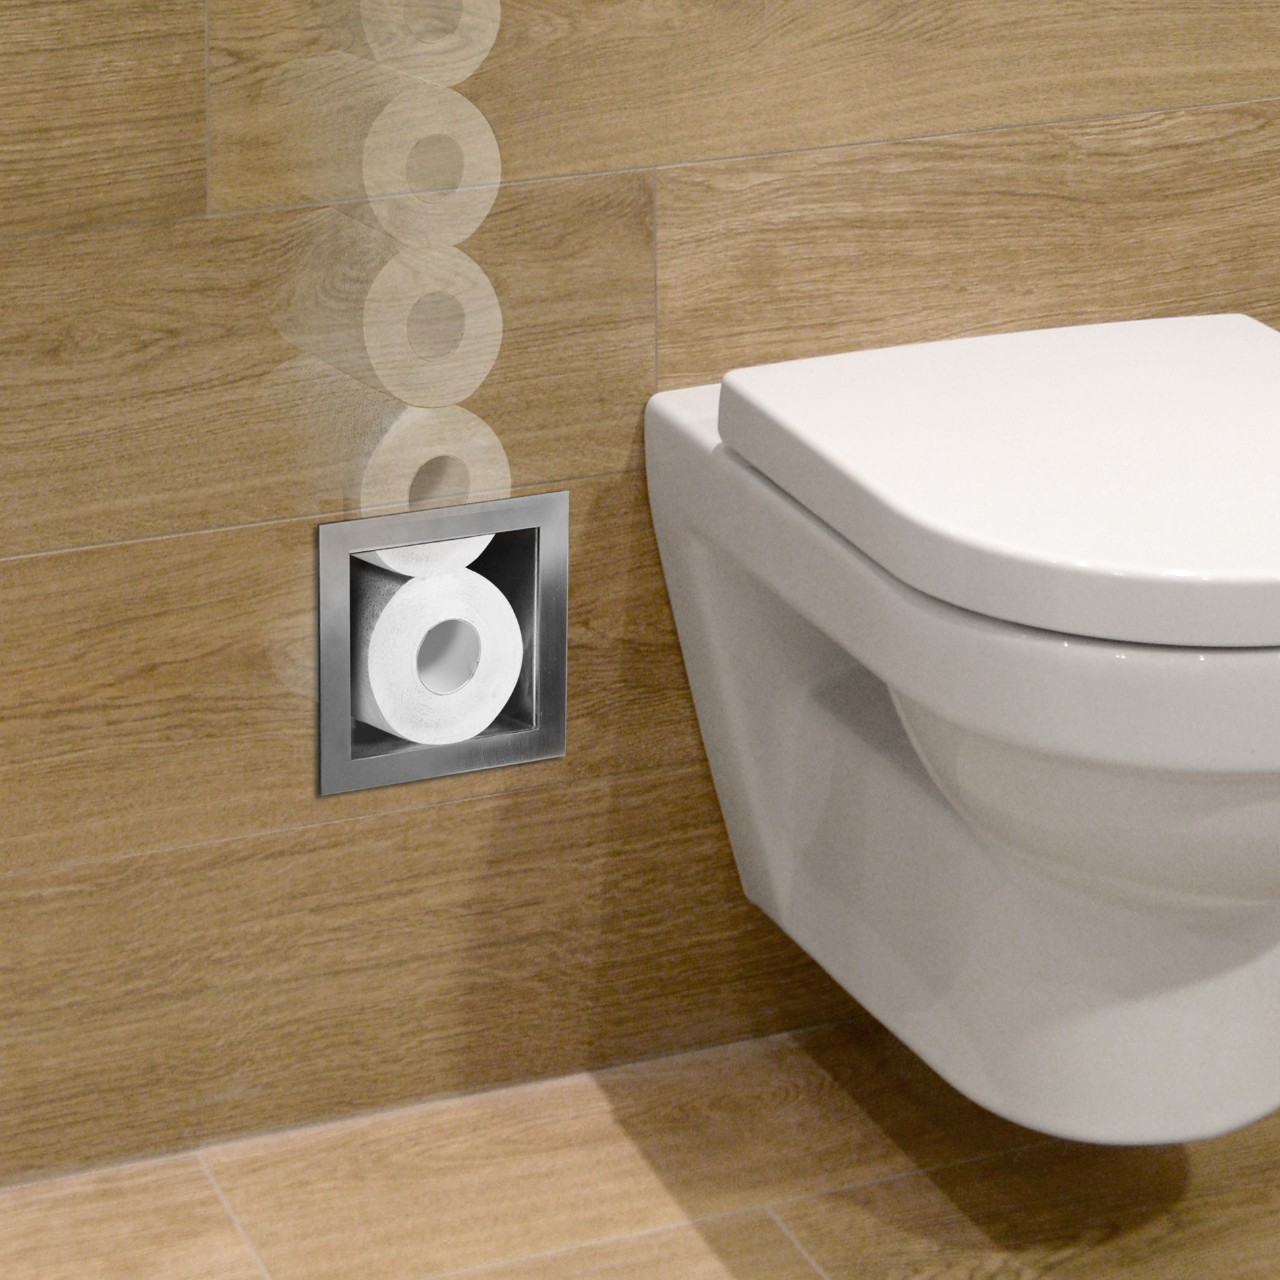 Looox toiletrolhouder en opbergsysteem